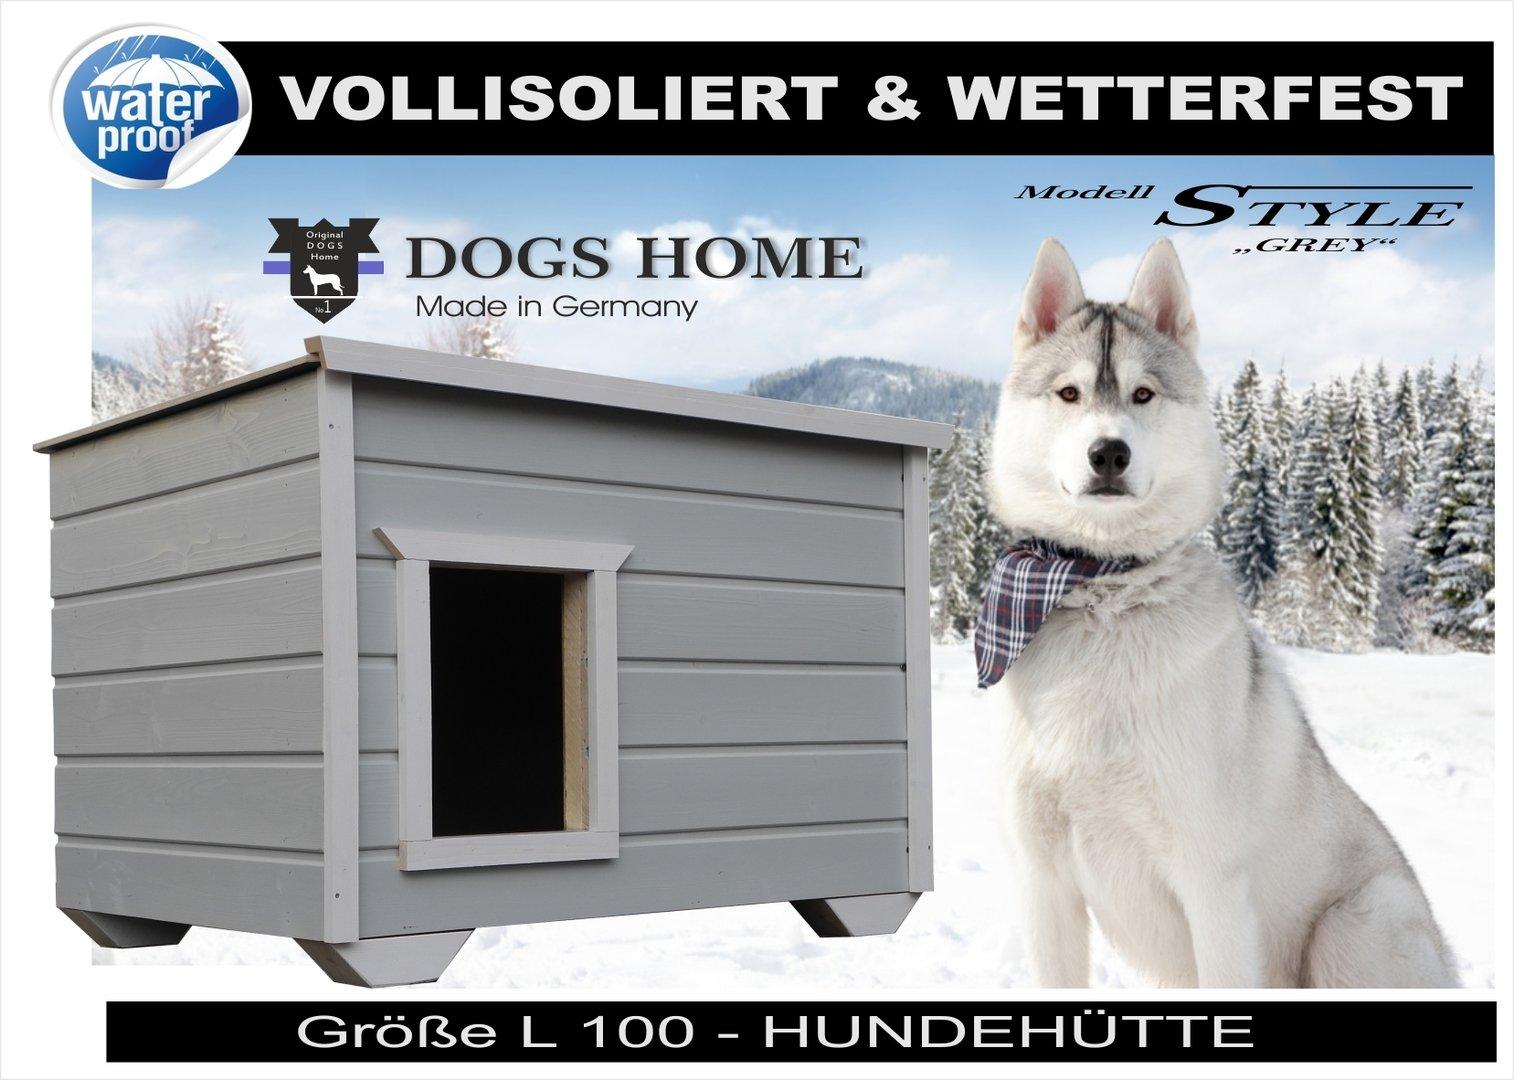 DOGSHOME Hundehütte Style Grey 20 L Outdoor vollisoliert